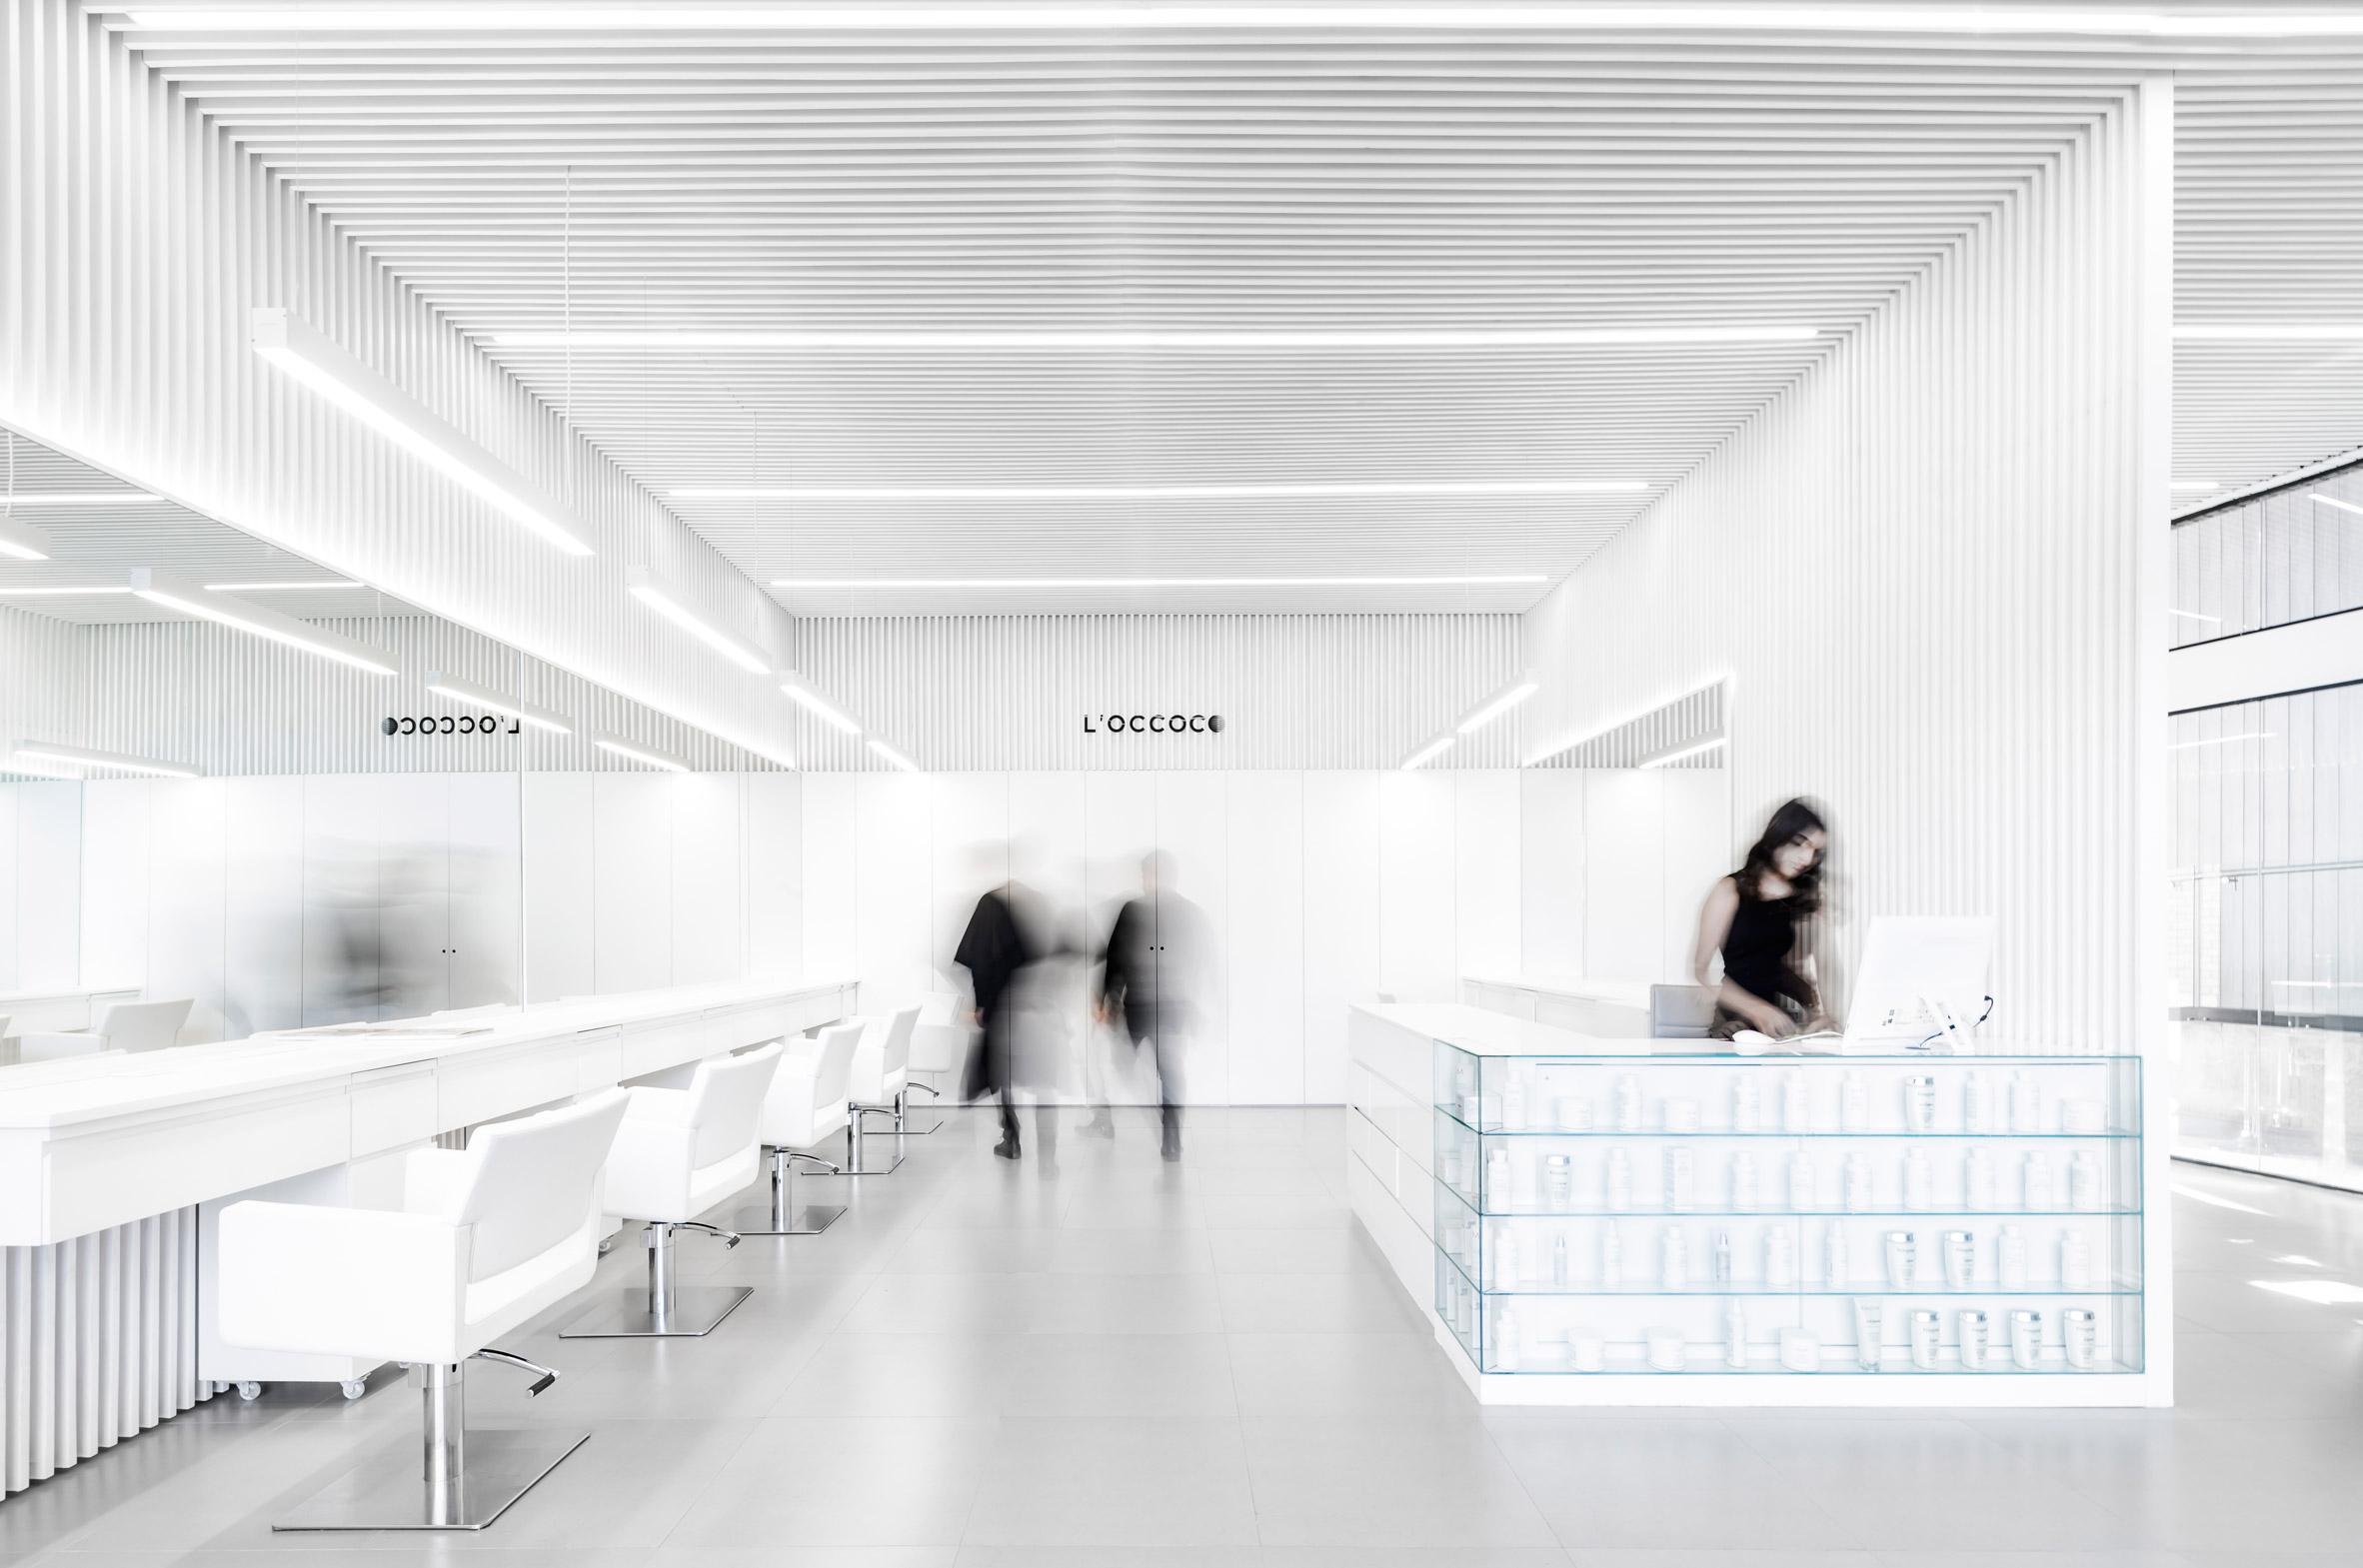 Abraham Cota Paredes creates stark white interior for hair salon in Mexico